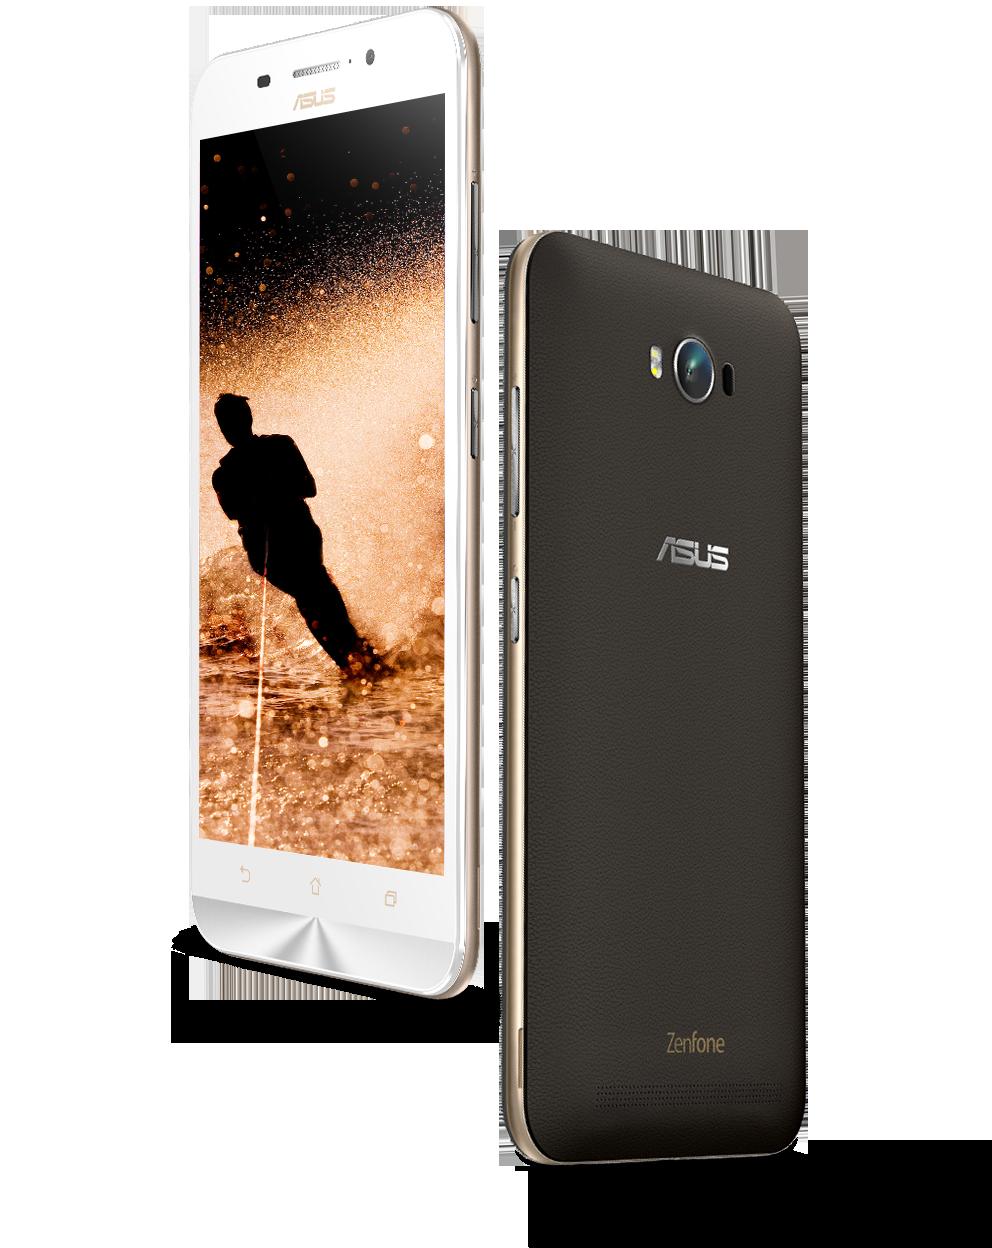 zenfone max zc550kl phone asus indonesia. Black Bedroom Furniture Sets. Home Design Ideas